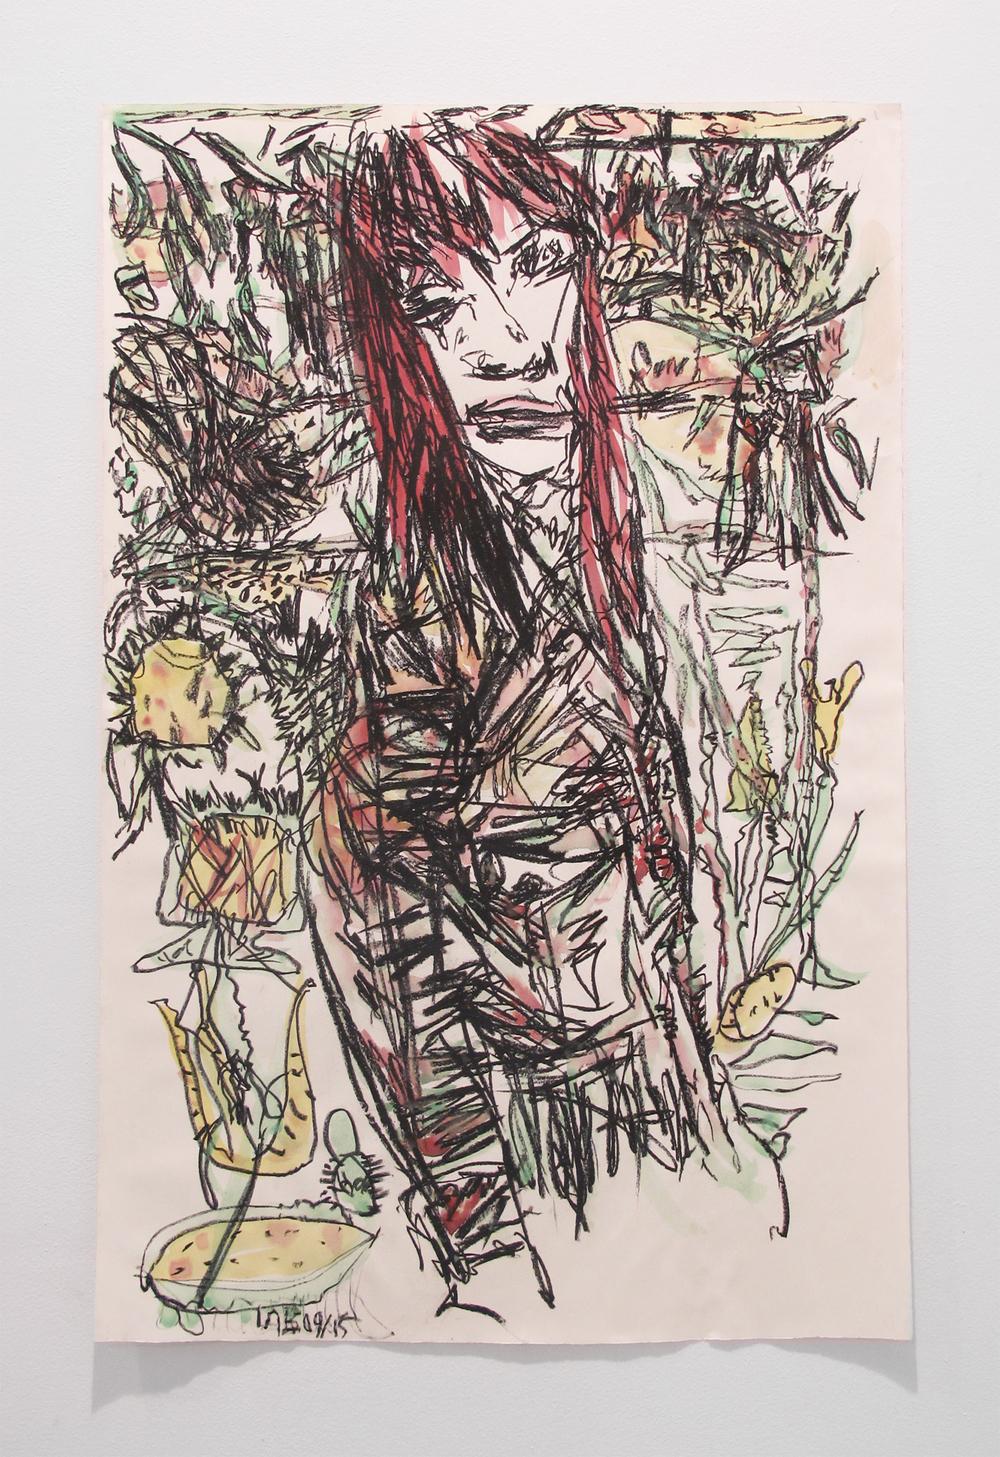 Aidas Bareikis, Solo 003 , 2009-15, paper, oil pastel, watercolor, 40 x 26 in